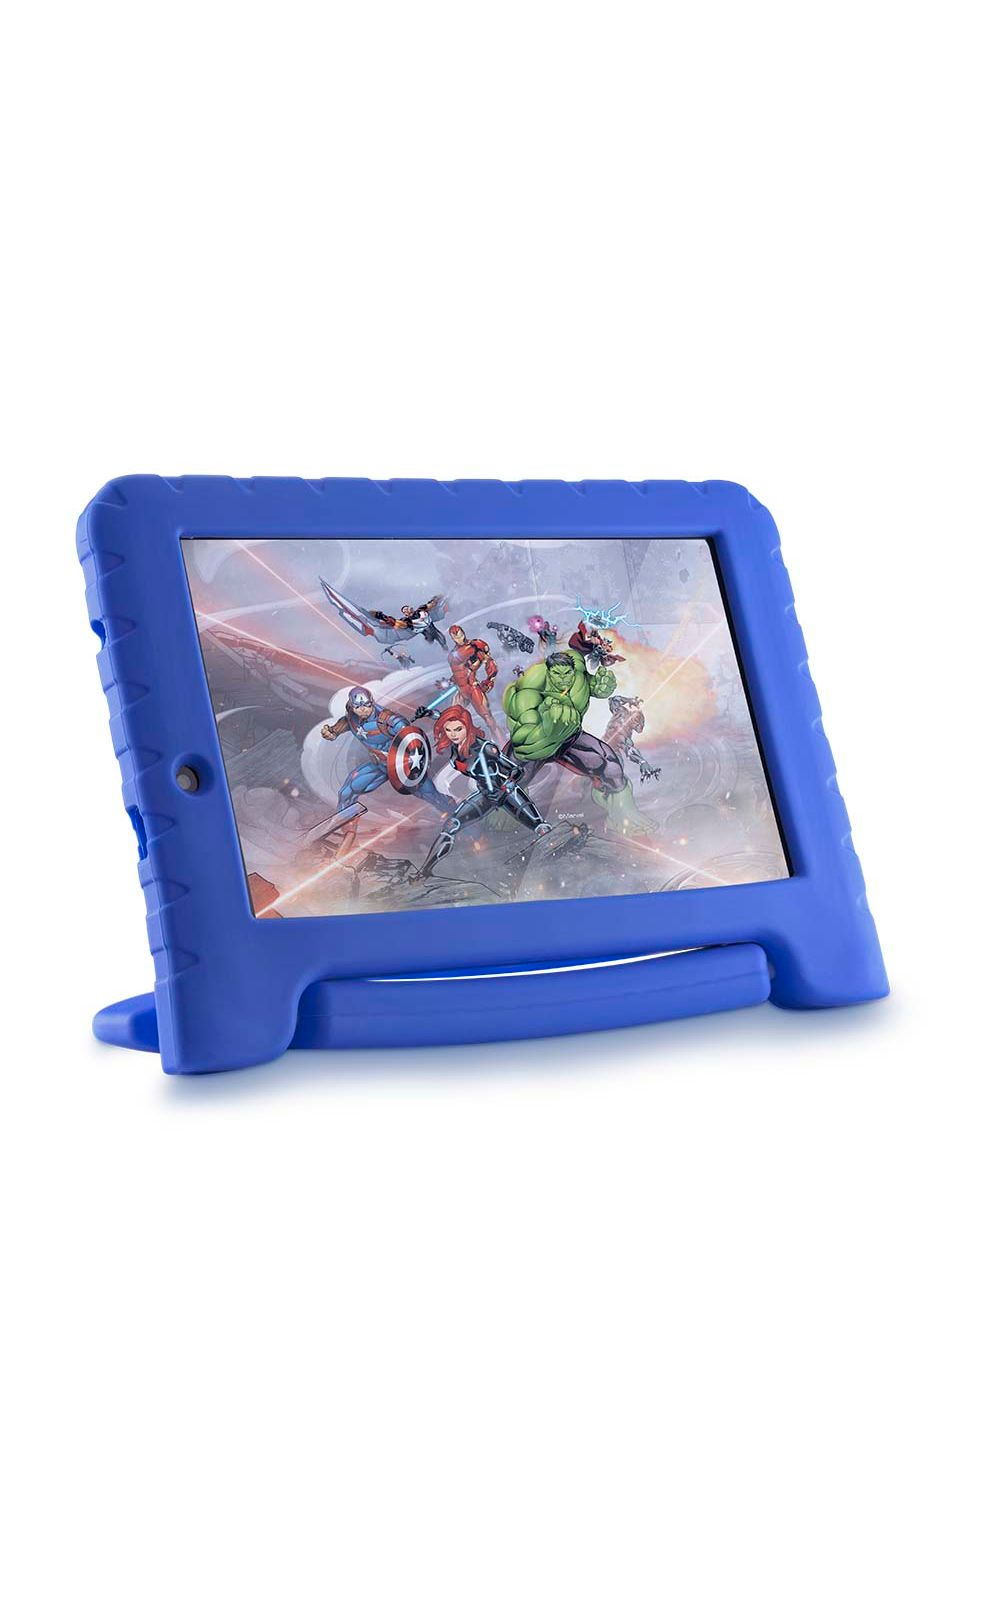 Foto 4 - Tablet Disney Vingadores Plus Wifi 8Gb Android 7 Dual Câmera Azul Multilaser - NB280